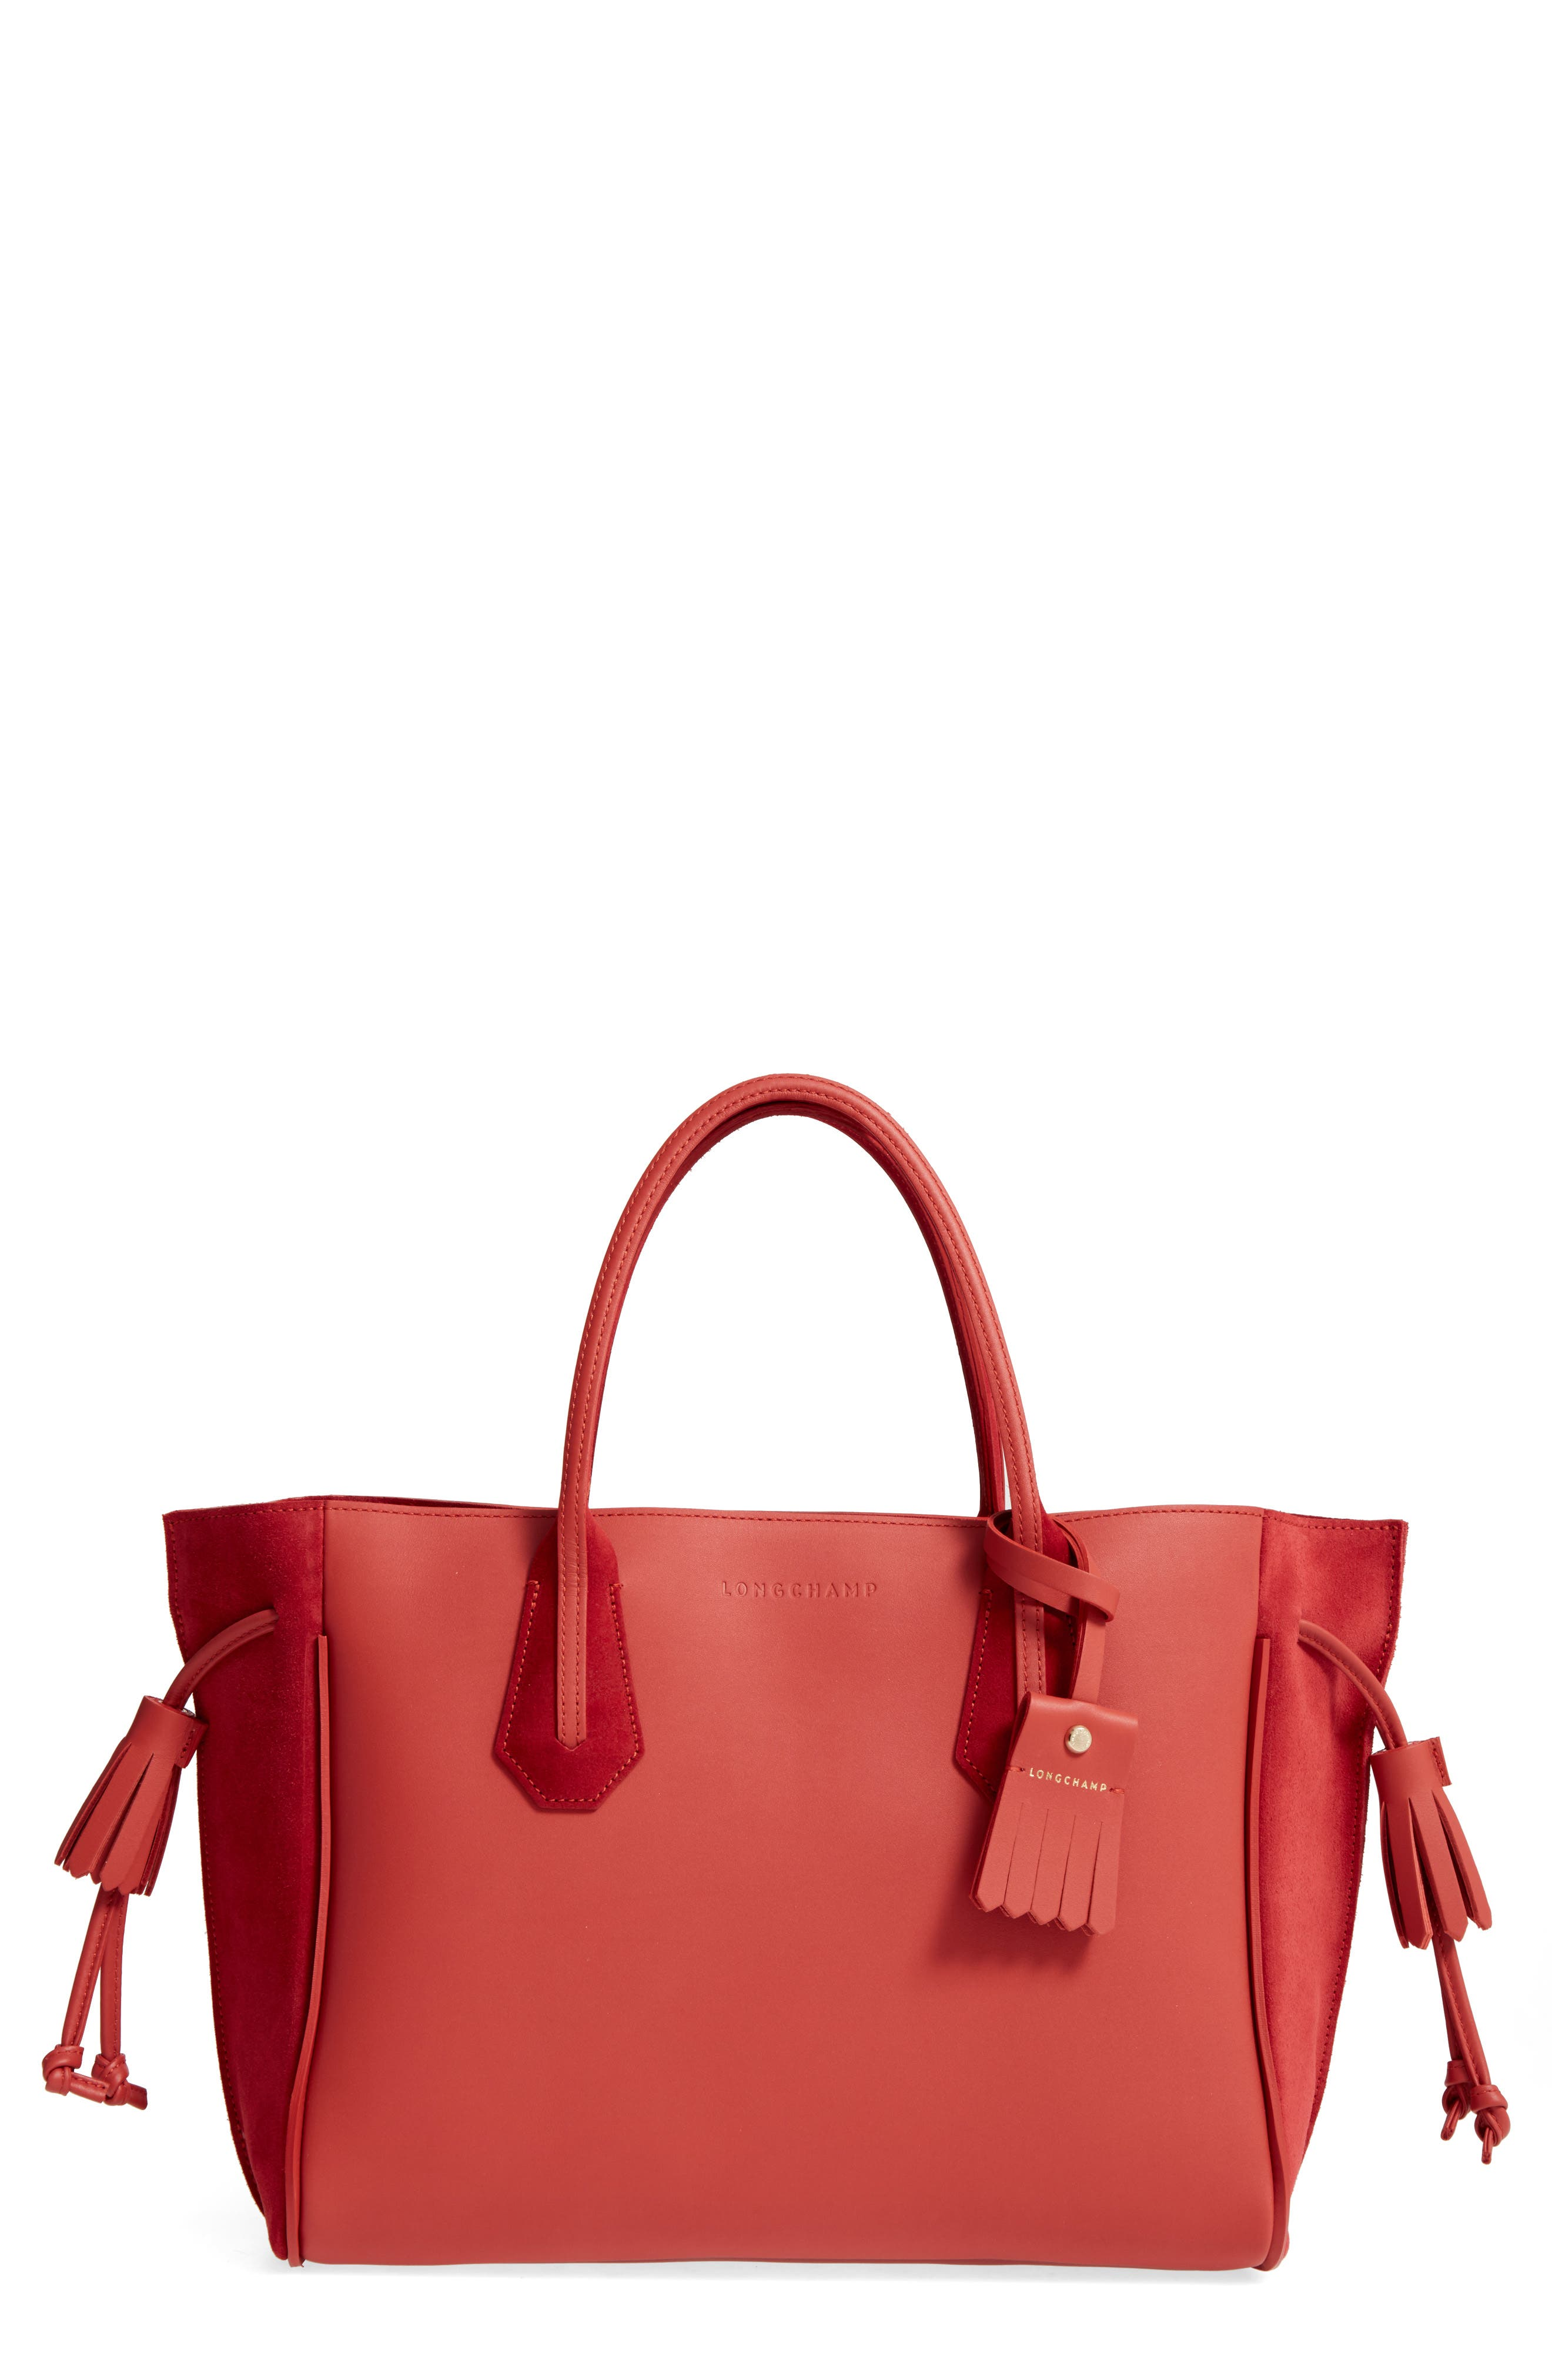 Longchamp Medium Penelope Fastaisie Leather Tote